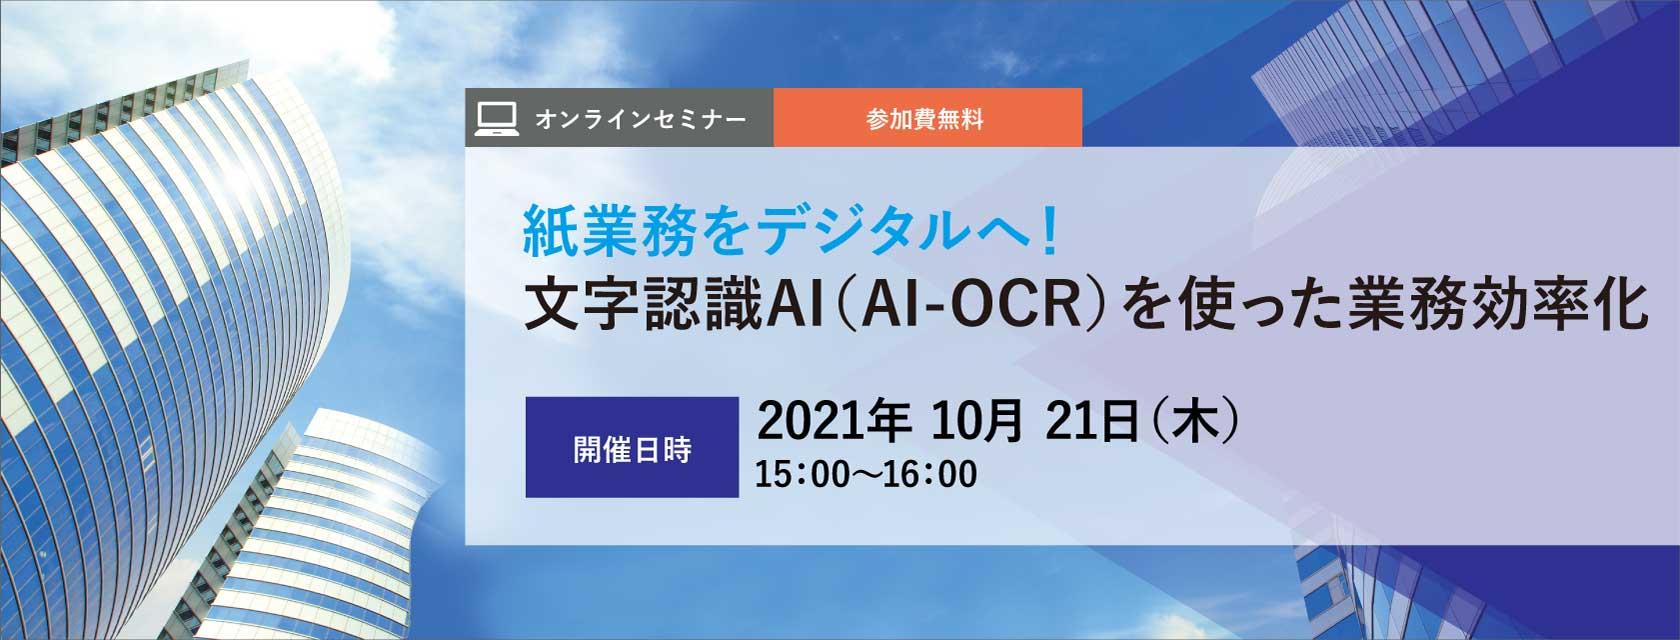 AI-OCRを活用した業務効率化